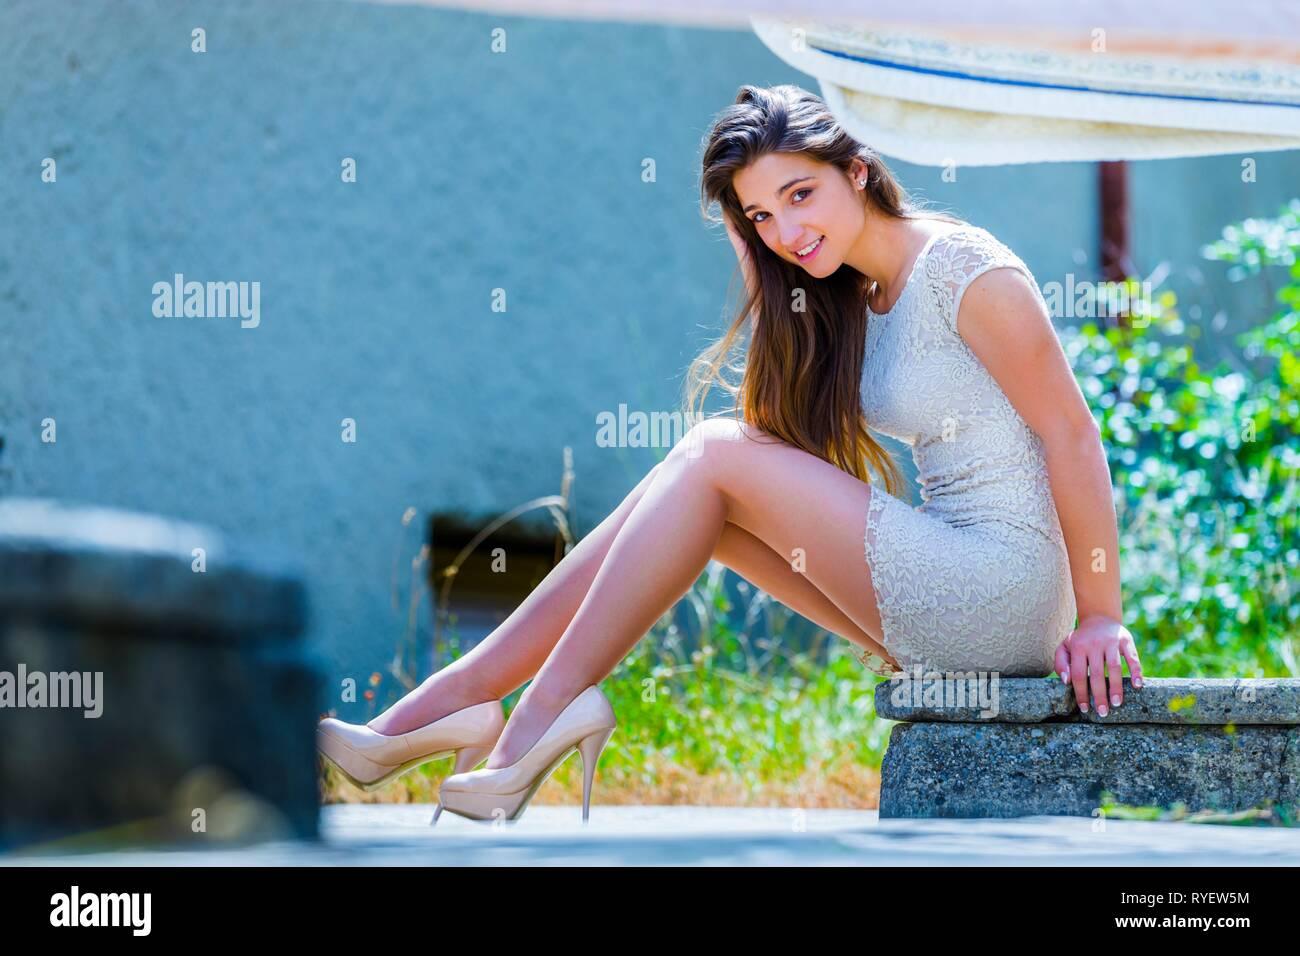 Pretty teen girl outside legs heels seated smiling brunette hair - Stock Image